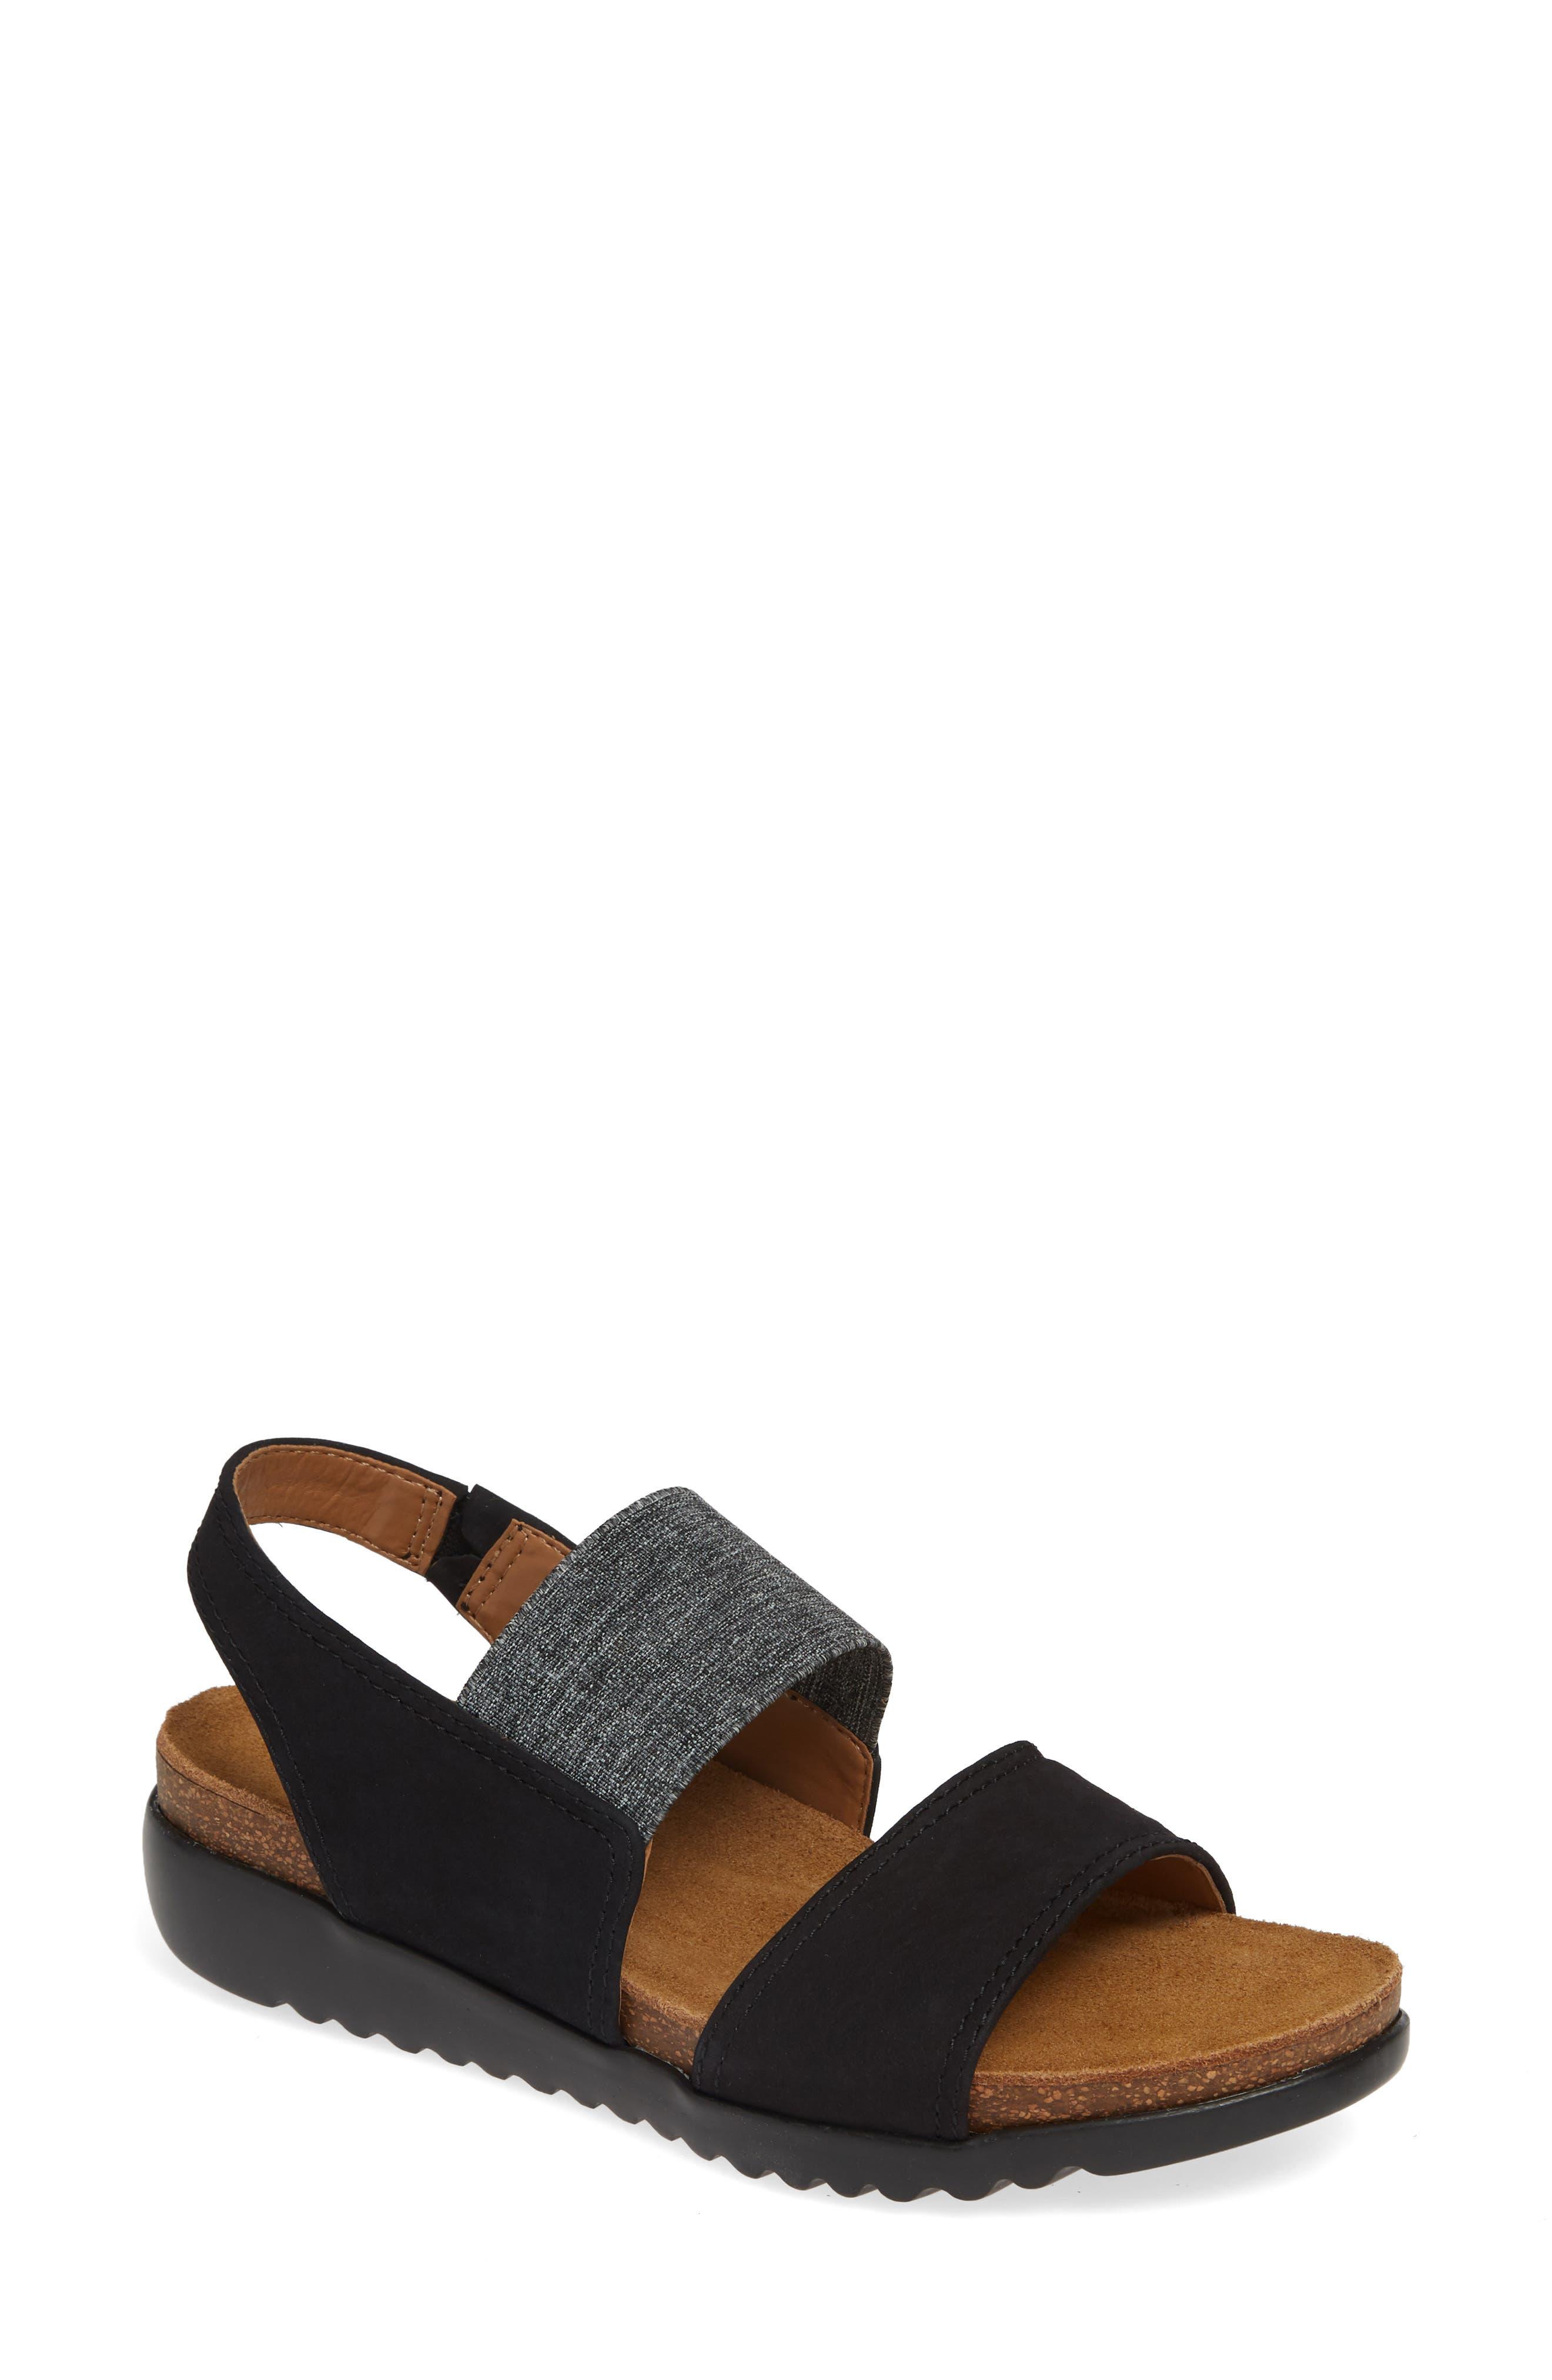 Comfortiva Elicia Wedge Sandal, Black